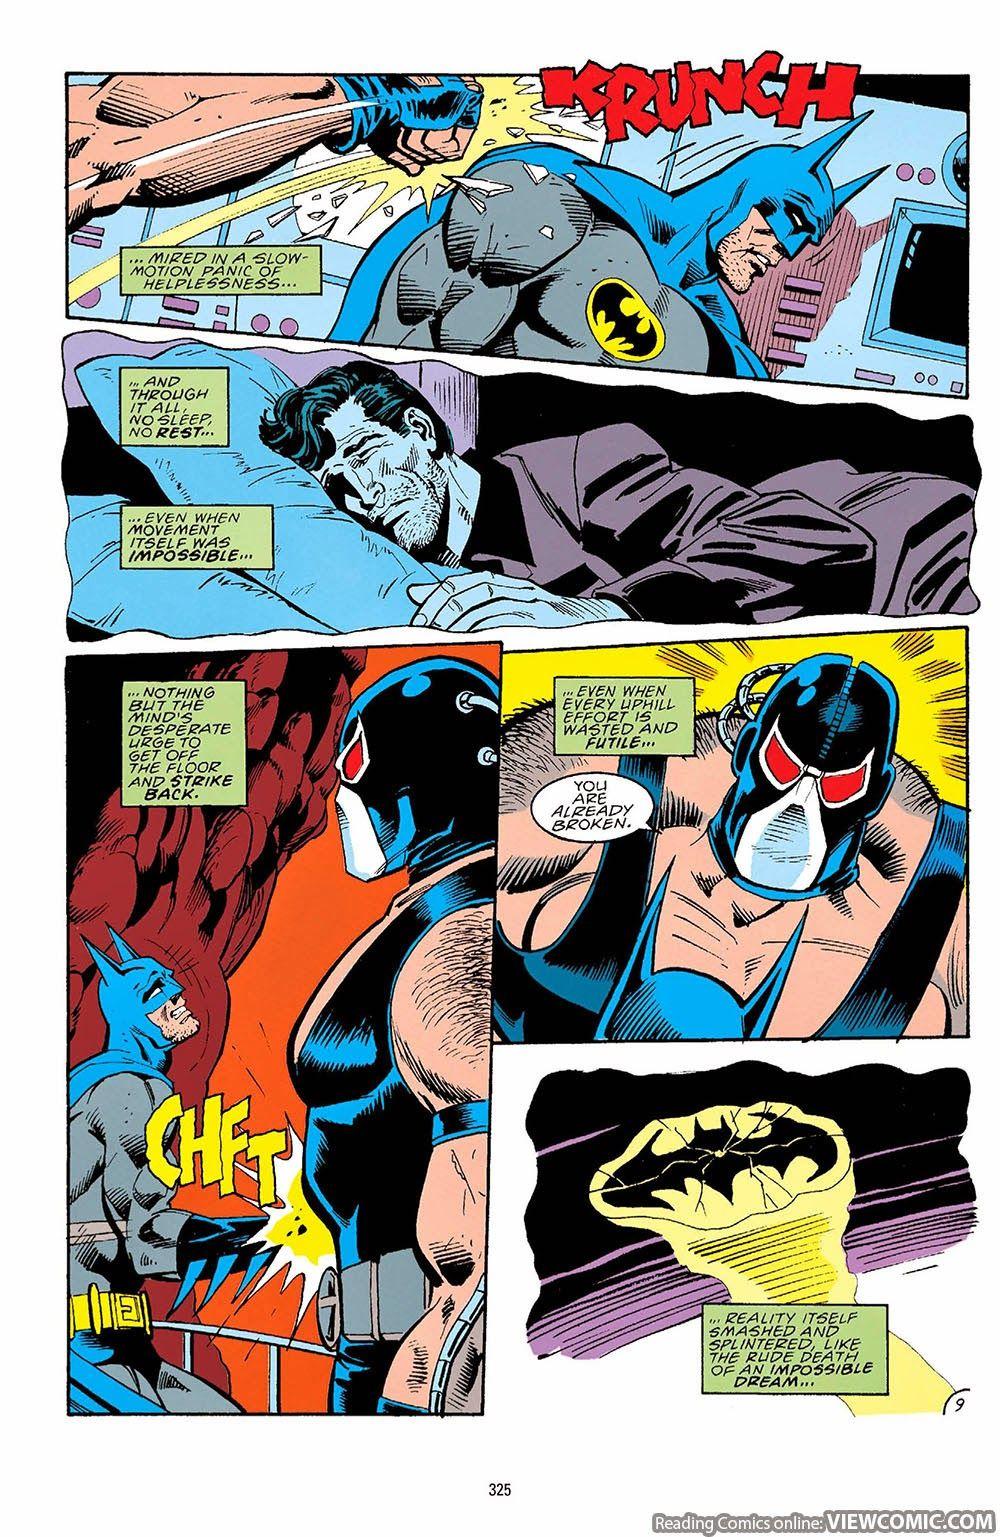 Batman – Knightfall Part 01 – Broken Bat (2000) | Viewcomic